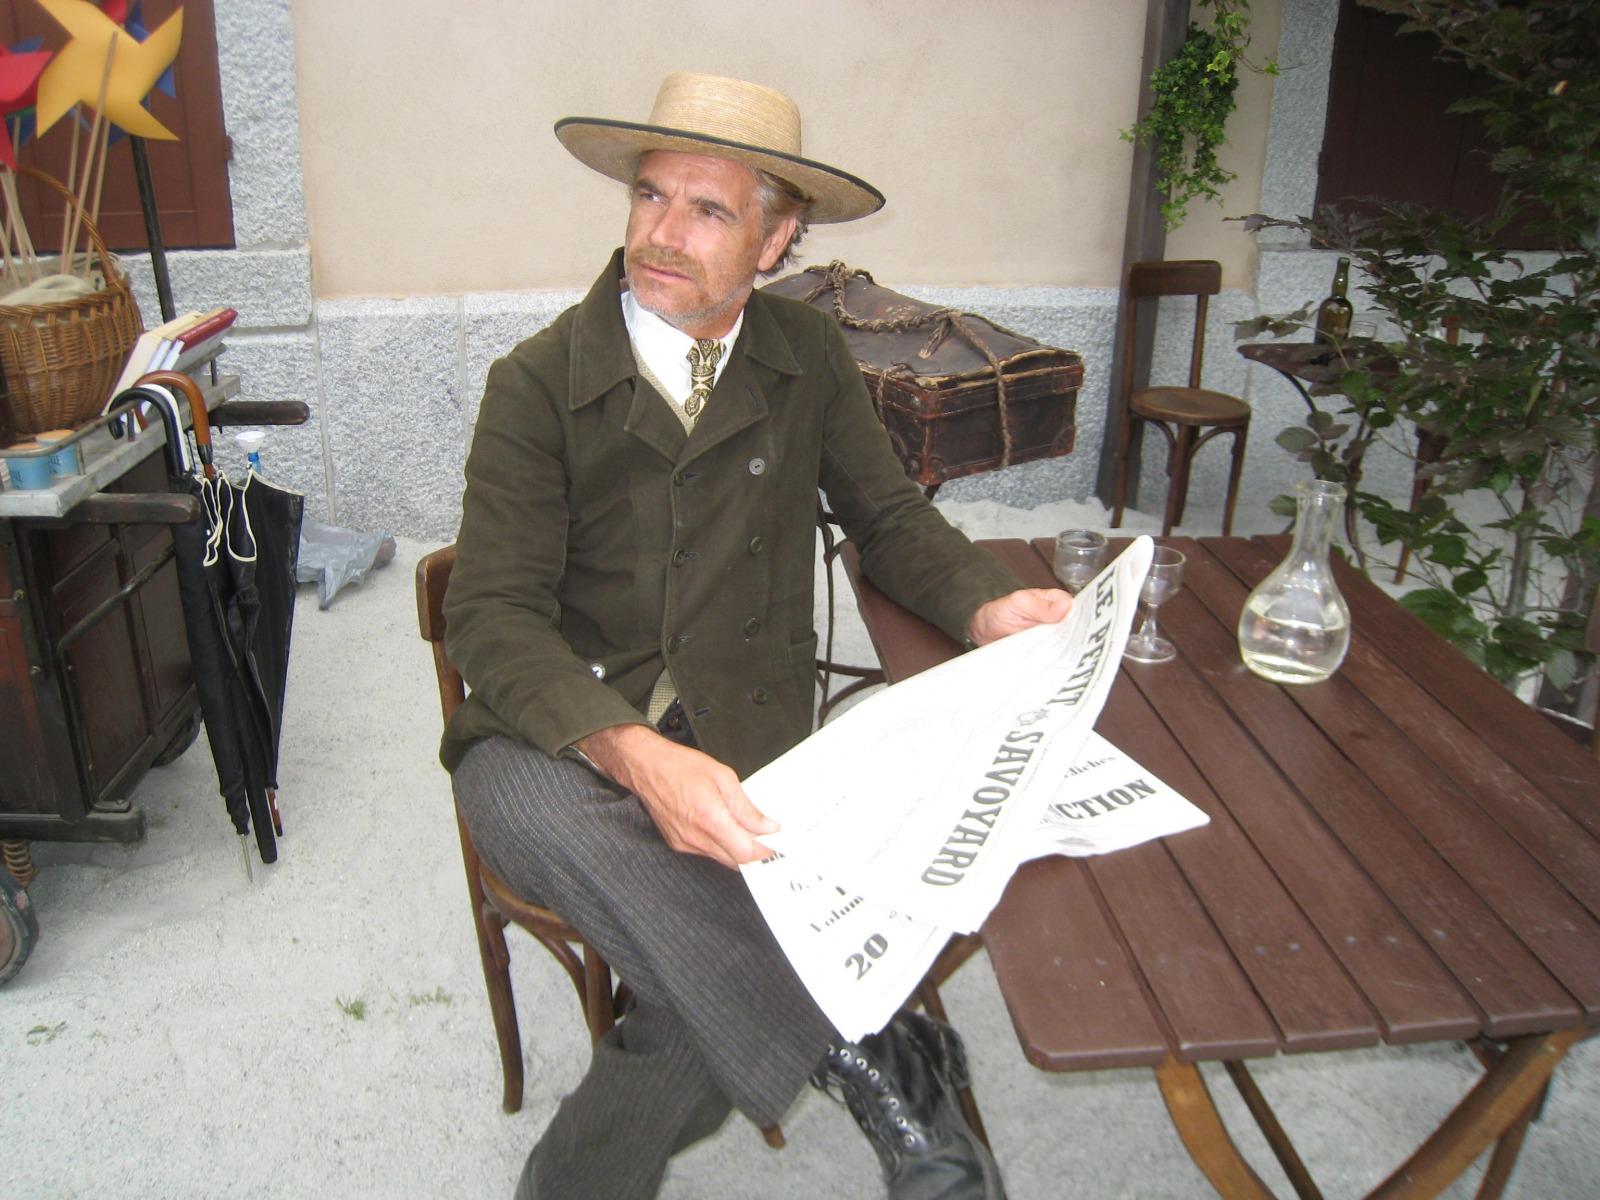 Eric-VERMET-Moustache-2